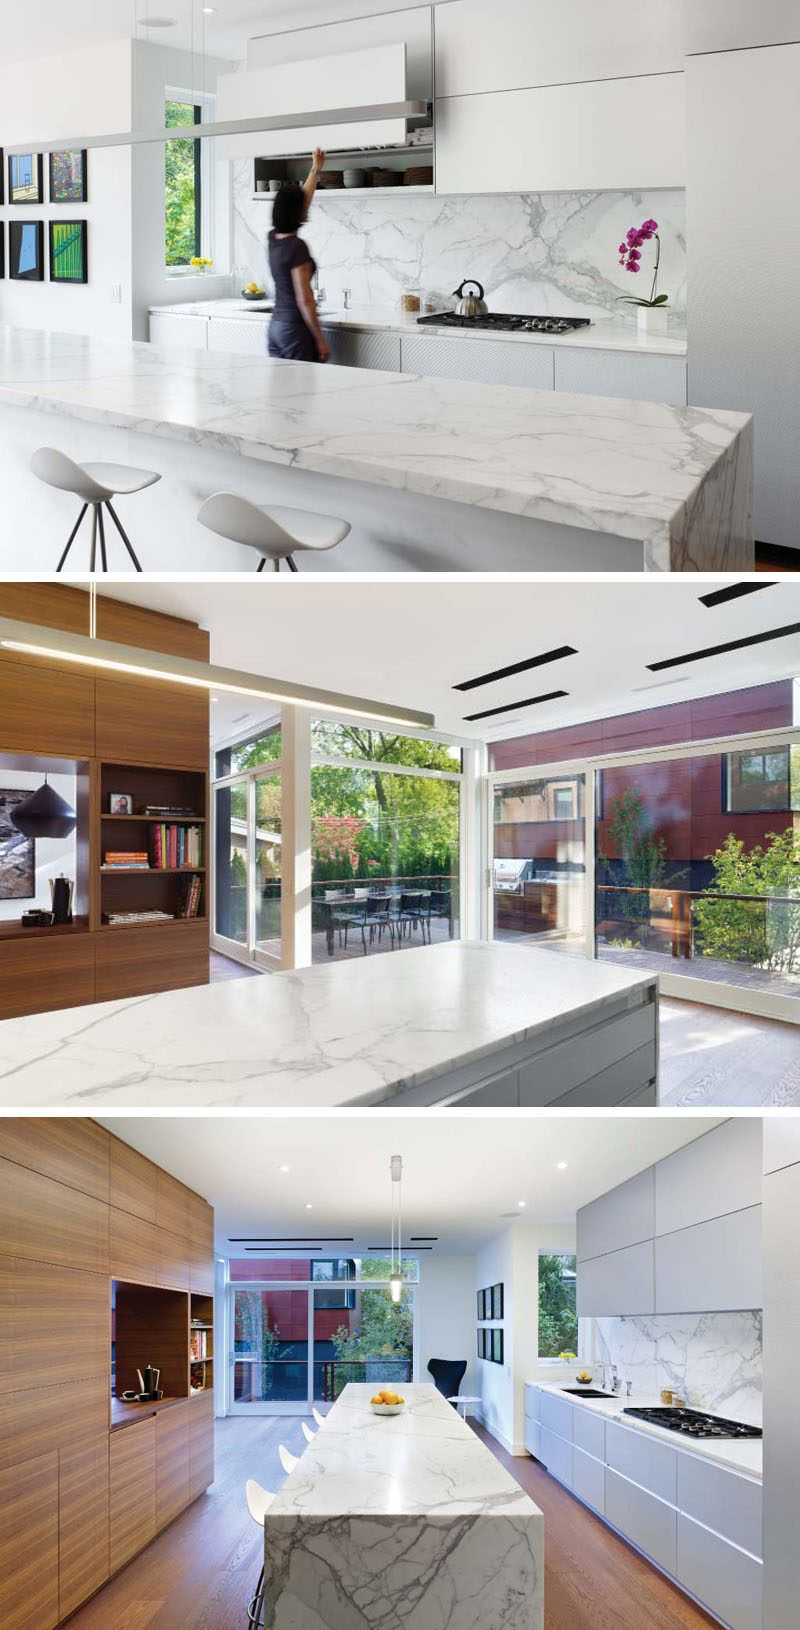 Kitchen Island Lighting Idea Use One Long Light Instead Of Multiple Pendant Lights Interior Architecture Design House Design Kitchen Island Lighting